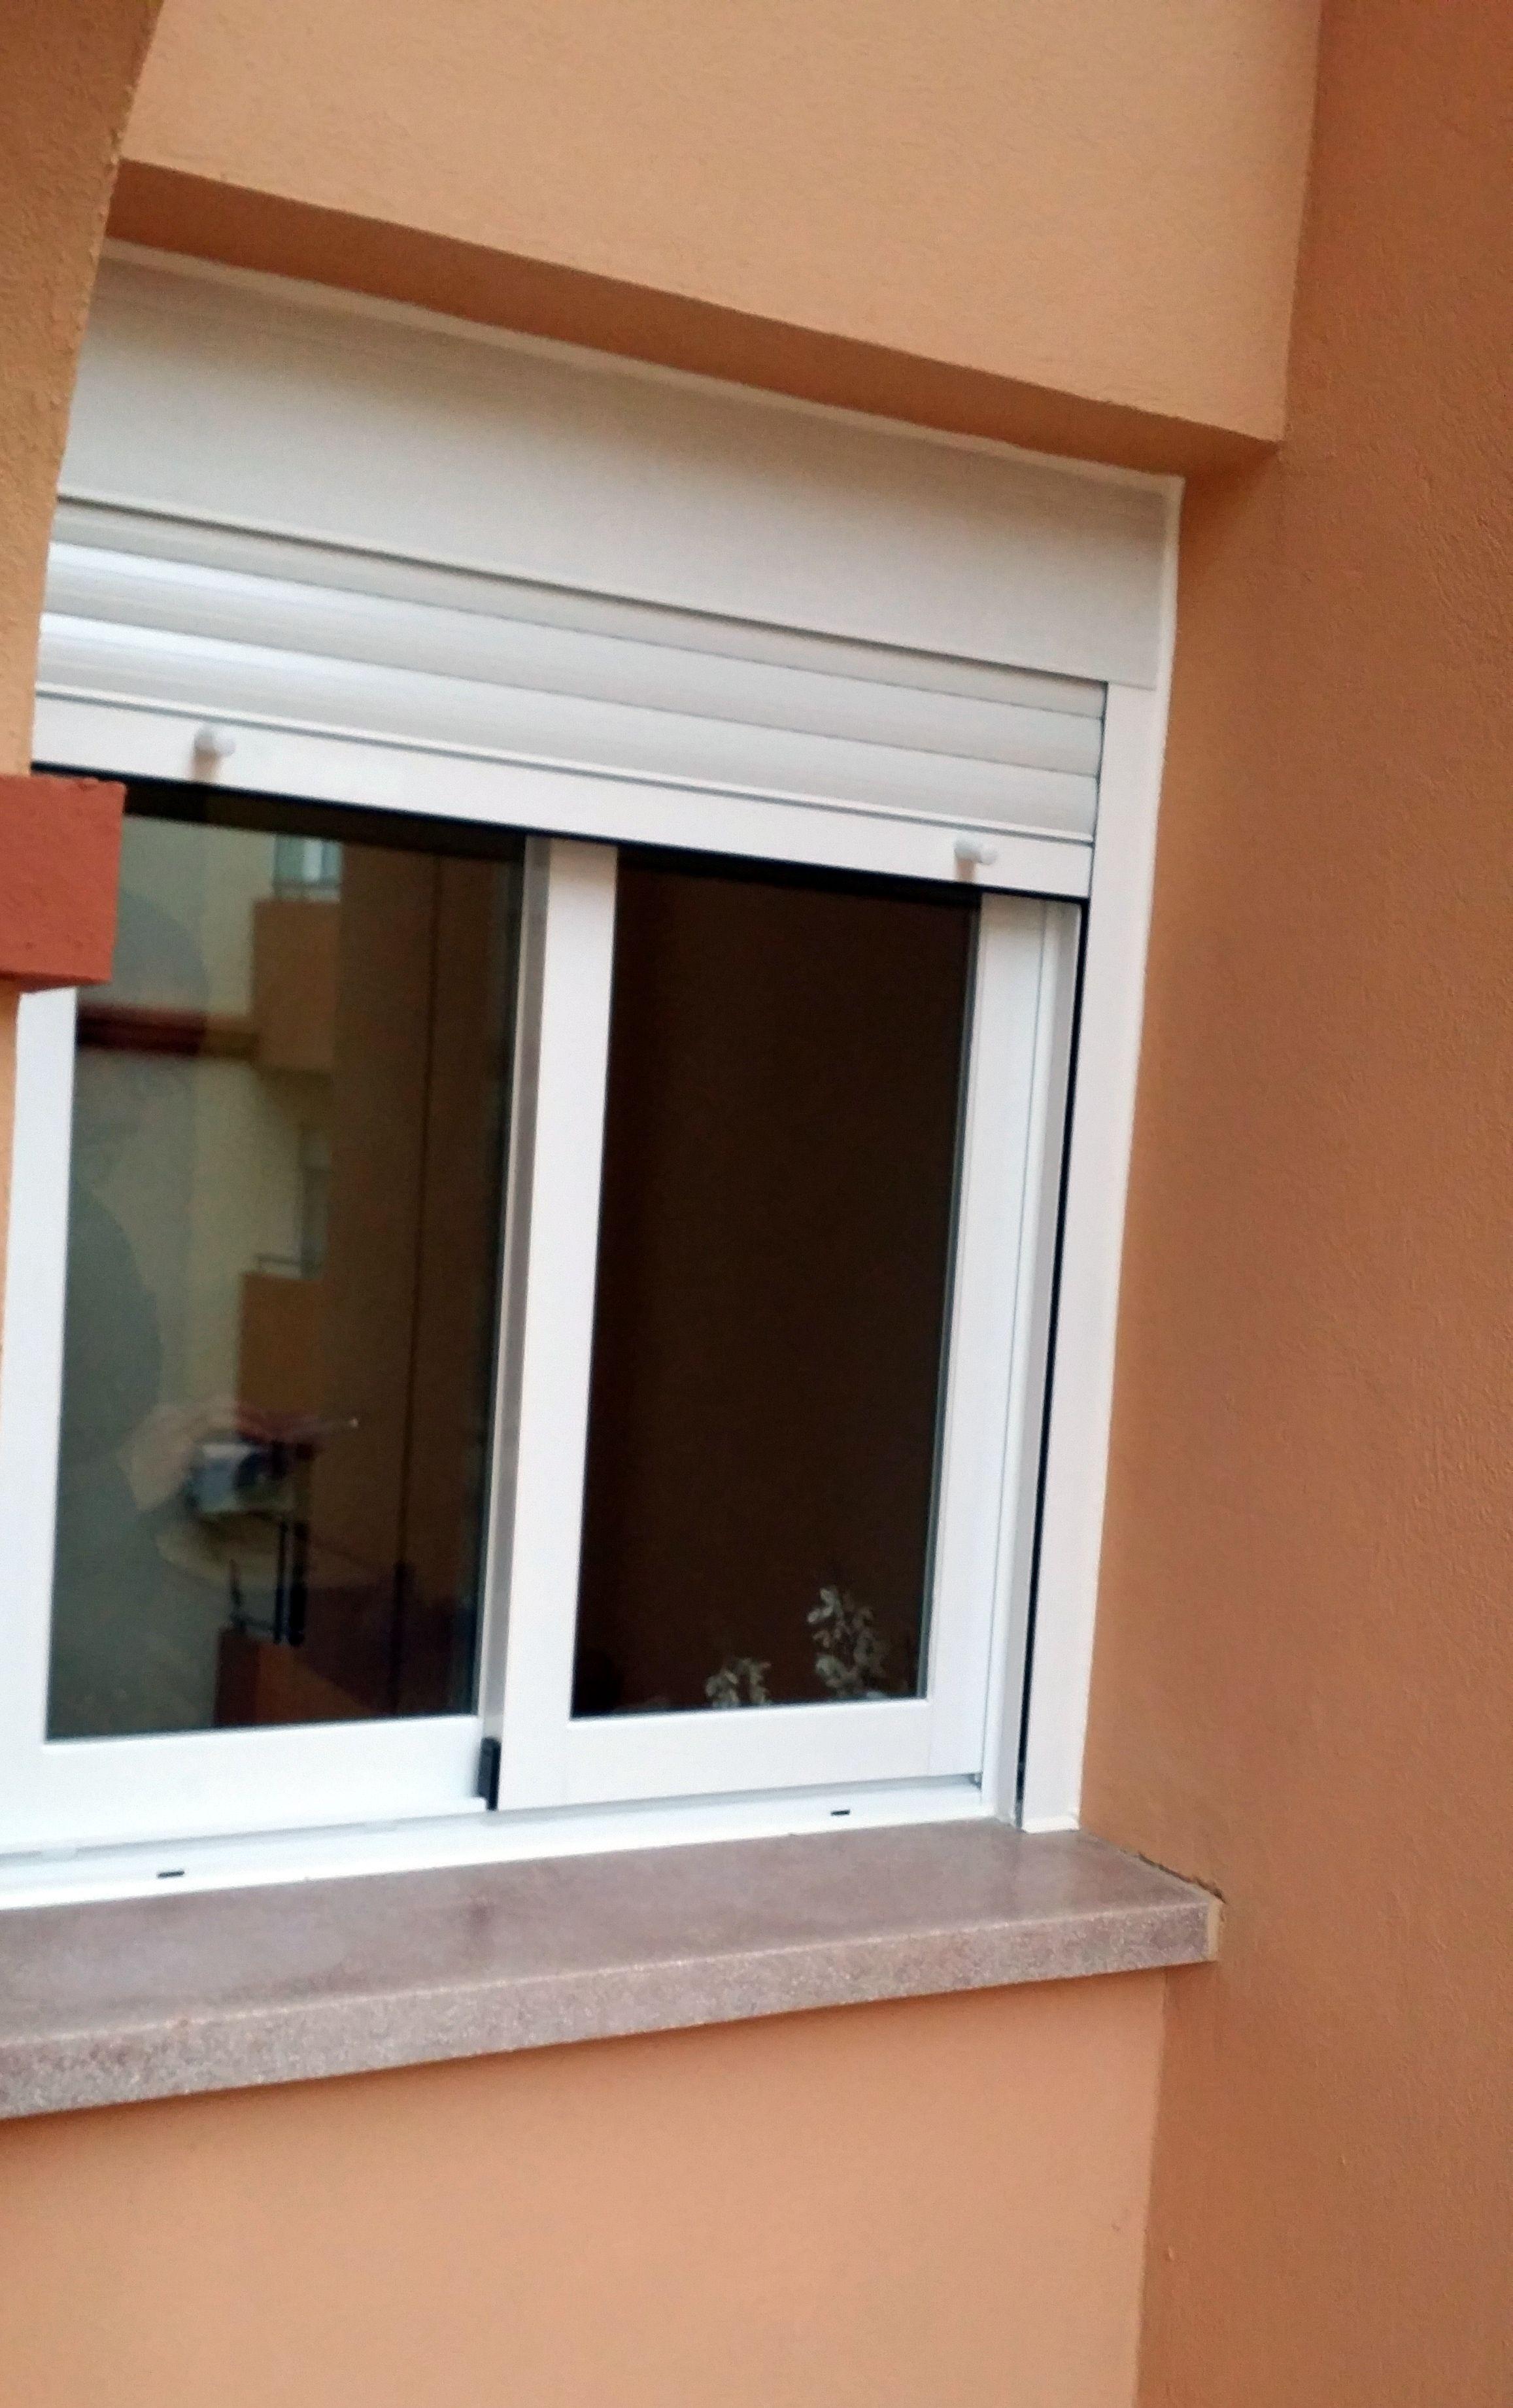 Ventana de Aluminio con persiana color blanco | Cerrajeria Cantalejo ...